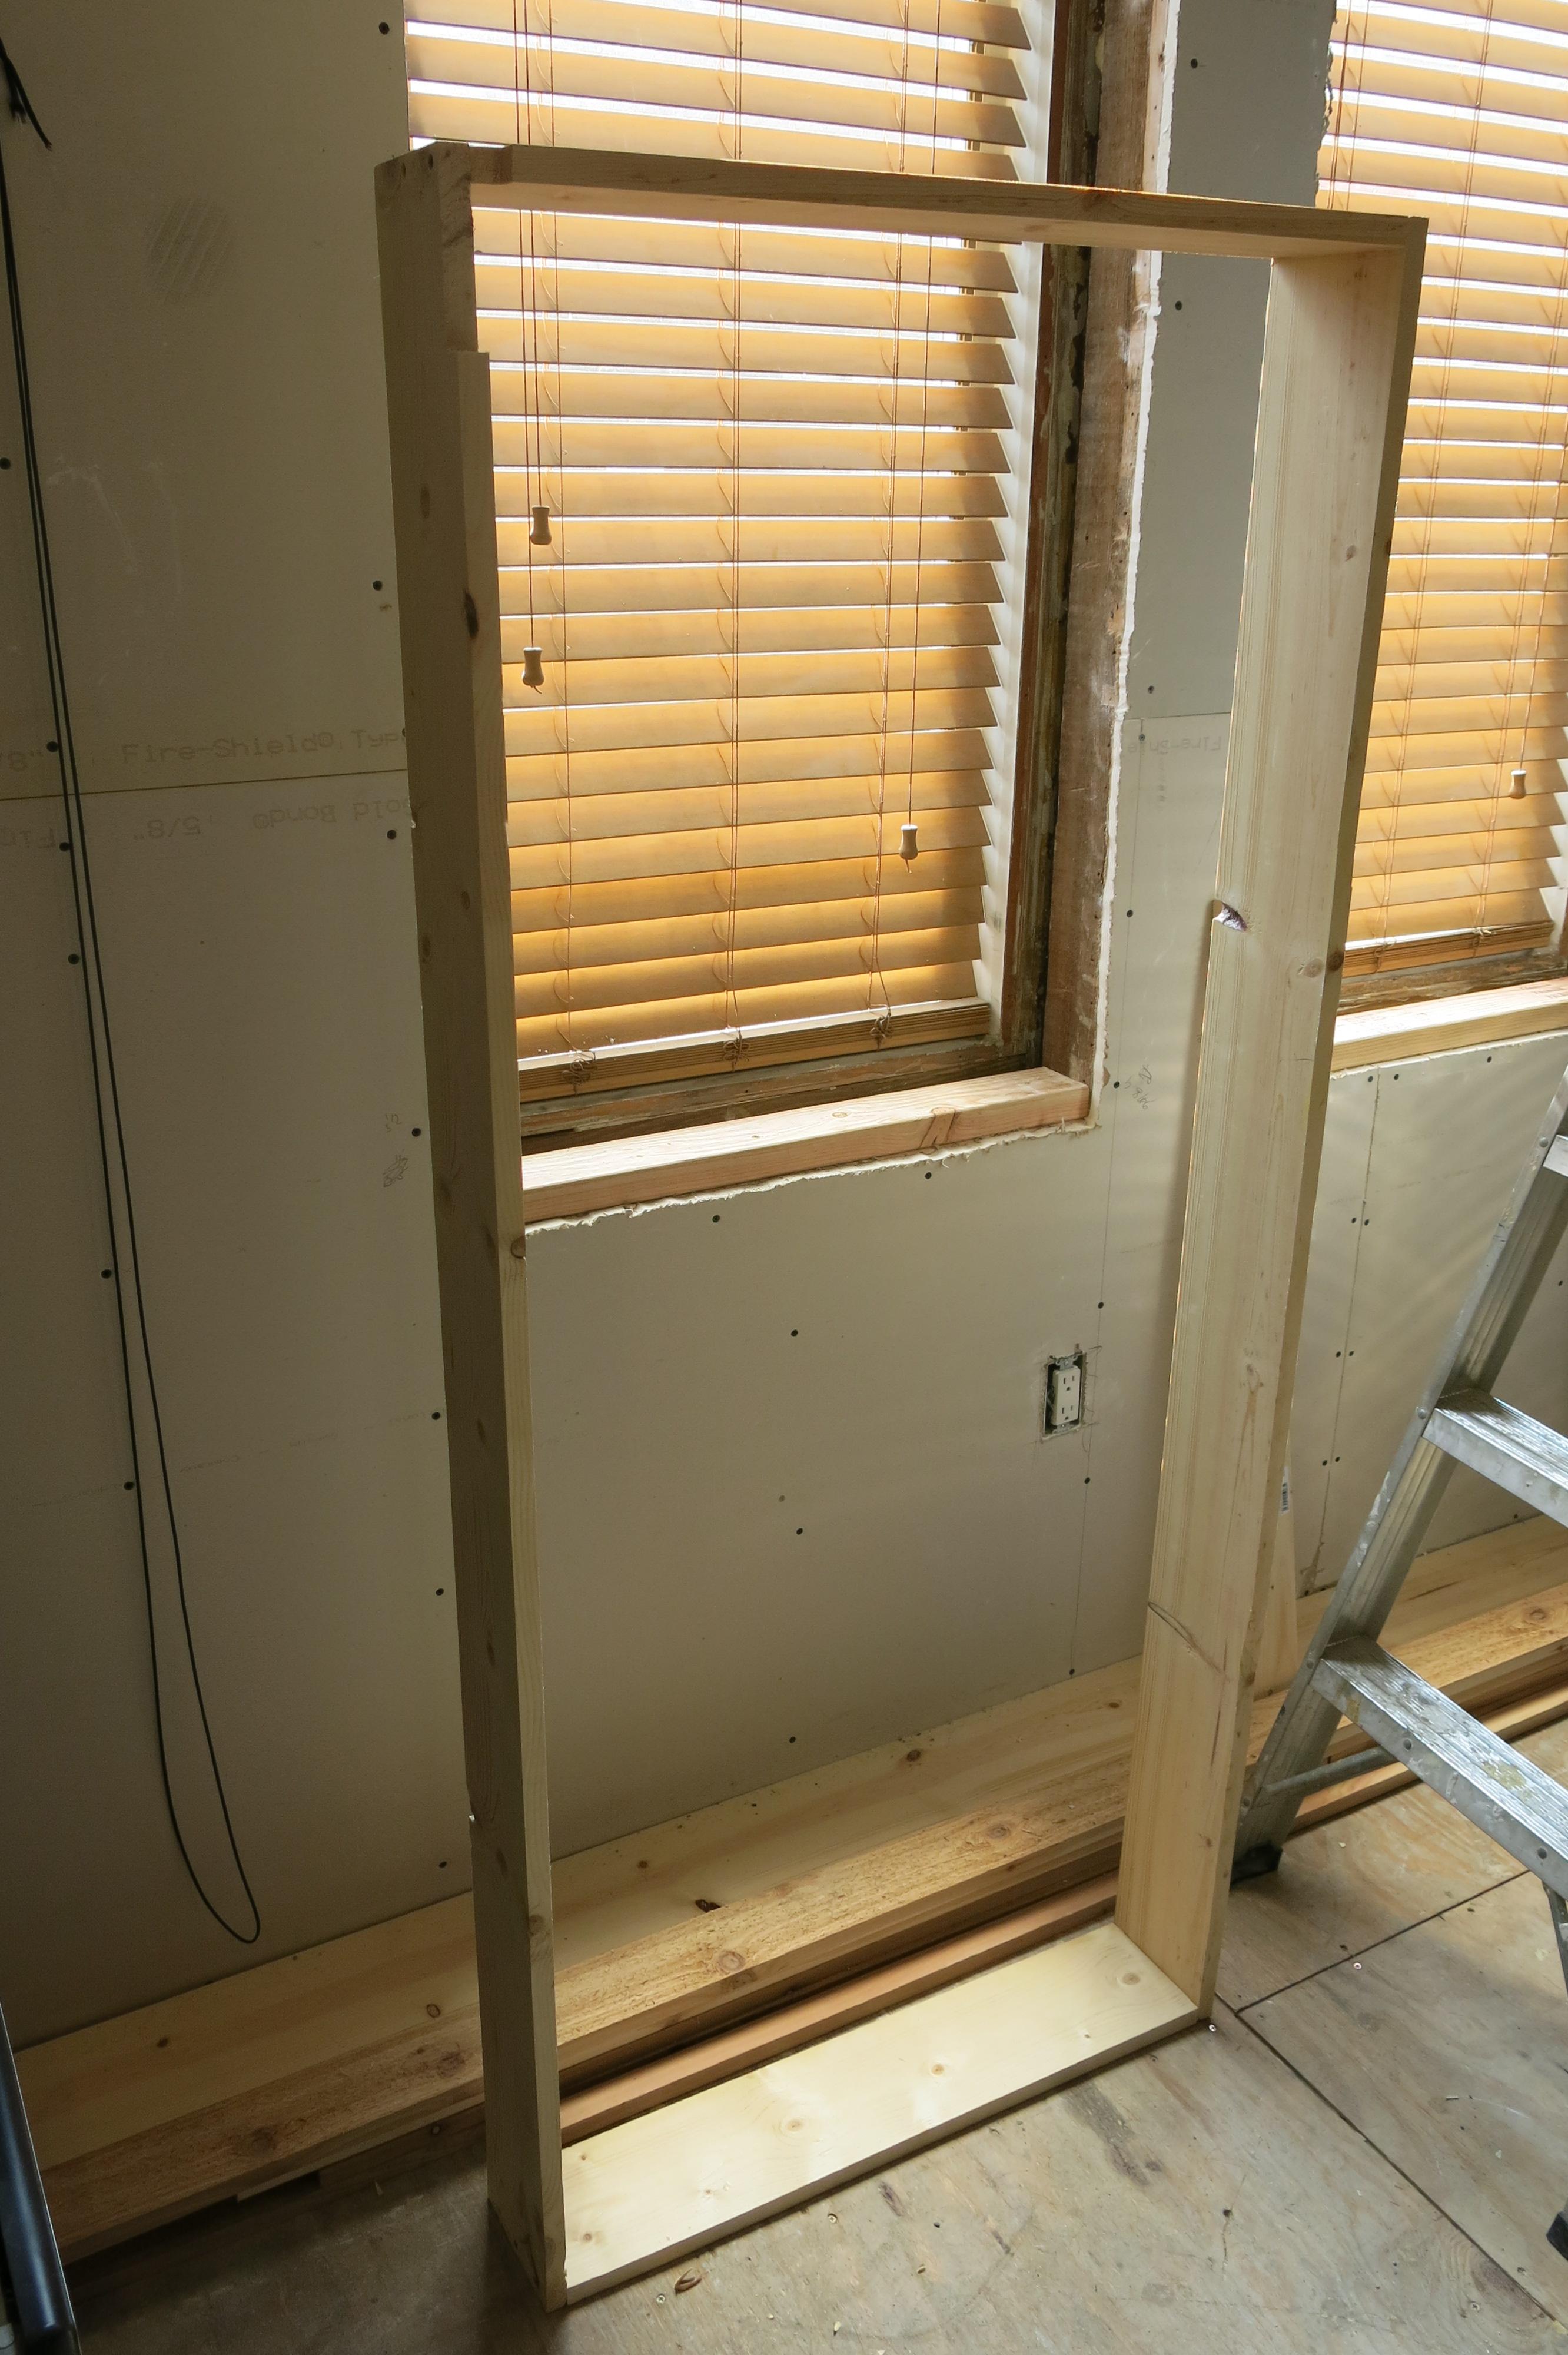 Lr window jamb extensions design build reside for Window jamb design